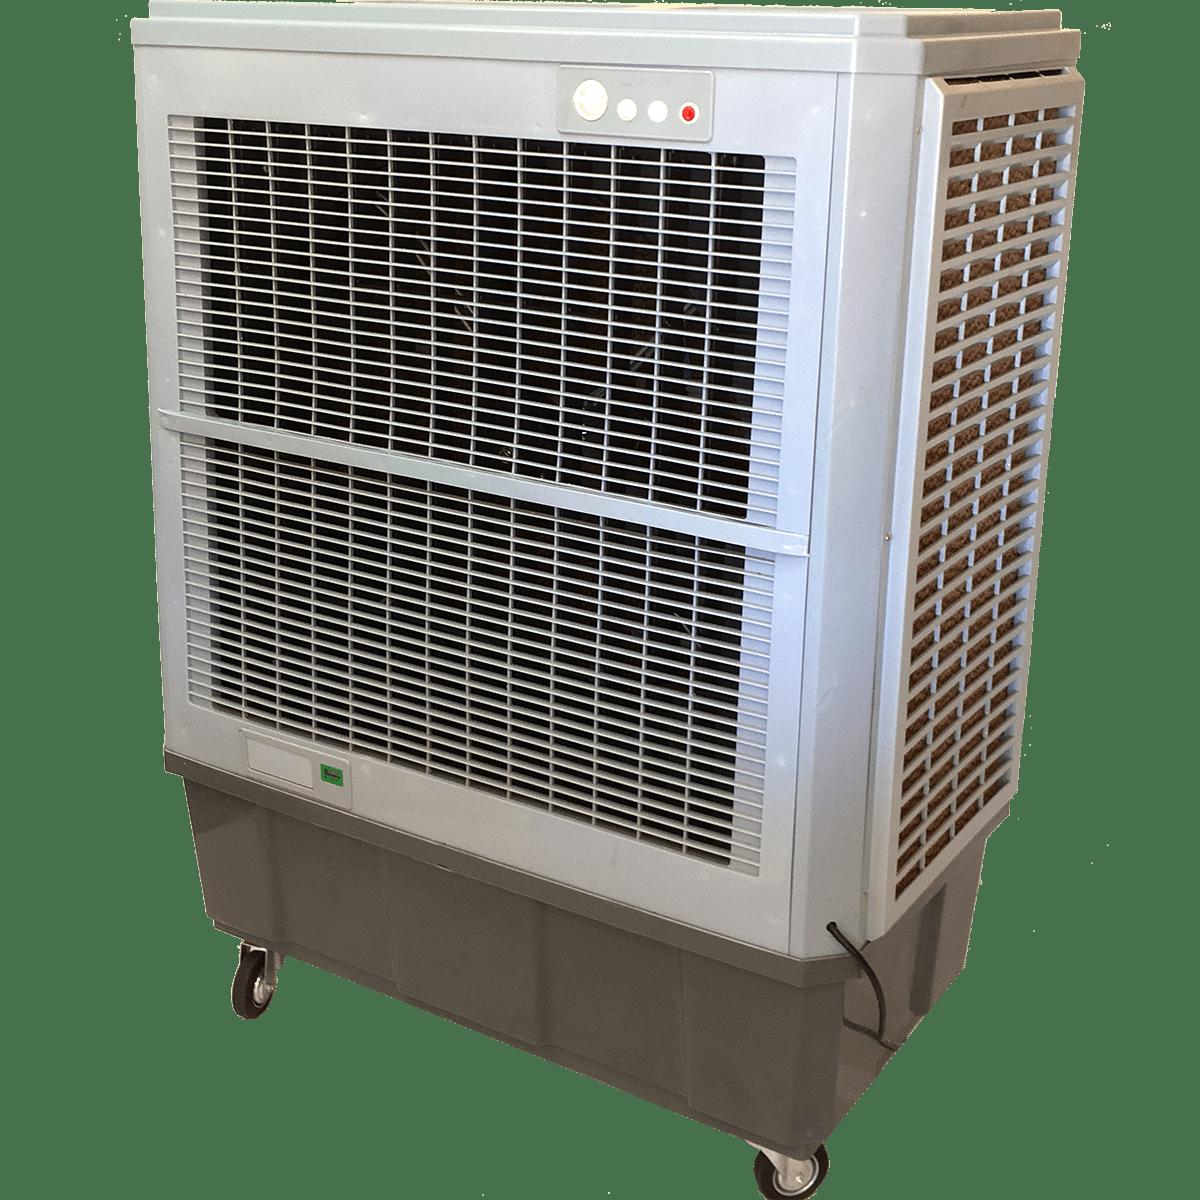 Arizona KuulKube AZ100MA Industrial Mobile Evaporative Cooler az6137